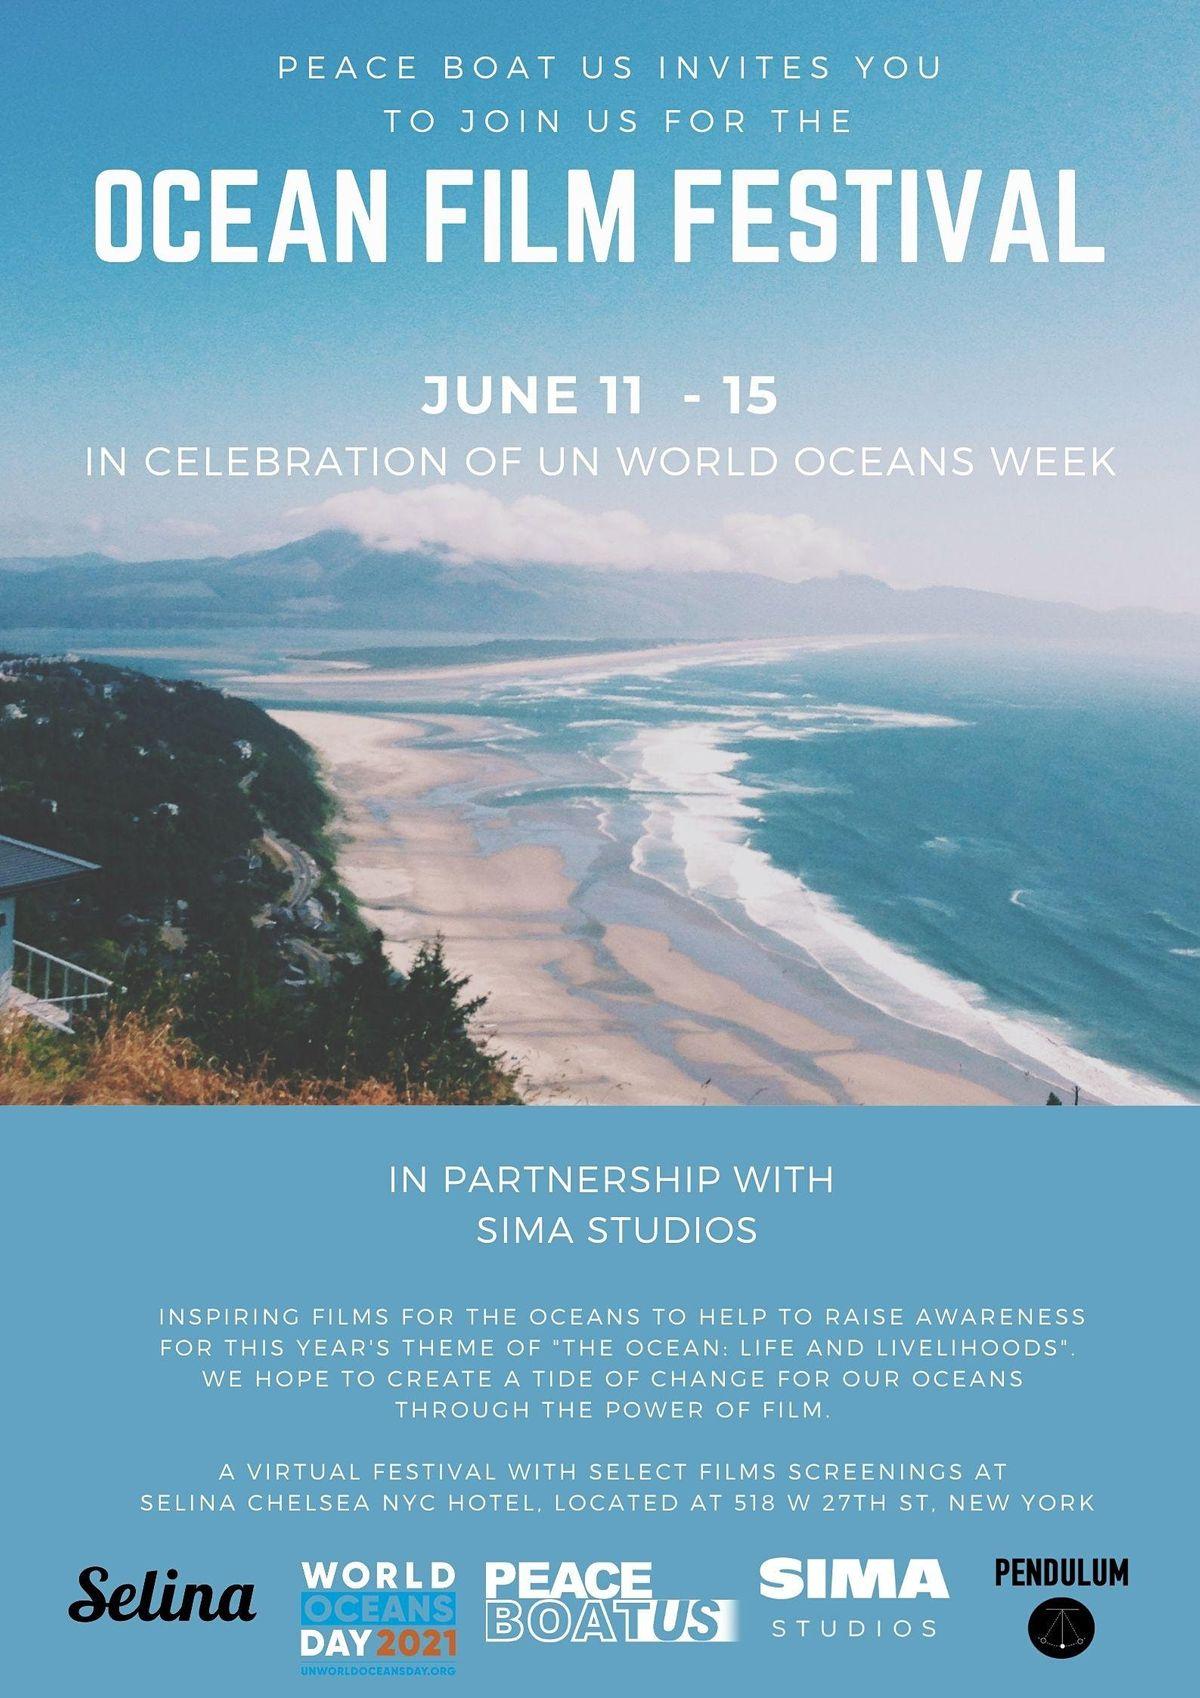 Ocean Film Festival in celebration of the United Nations World Oceans Week